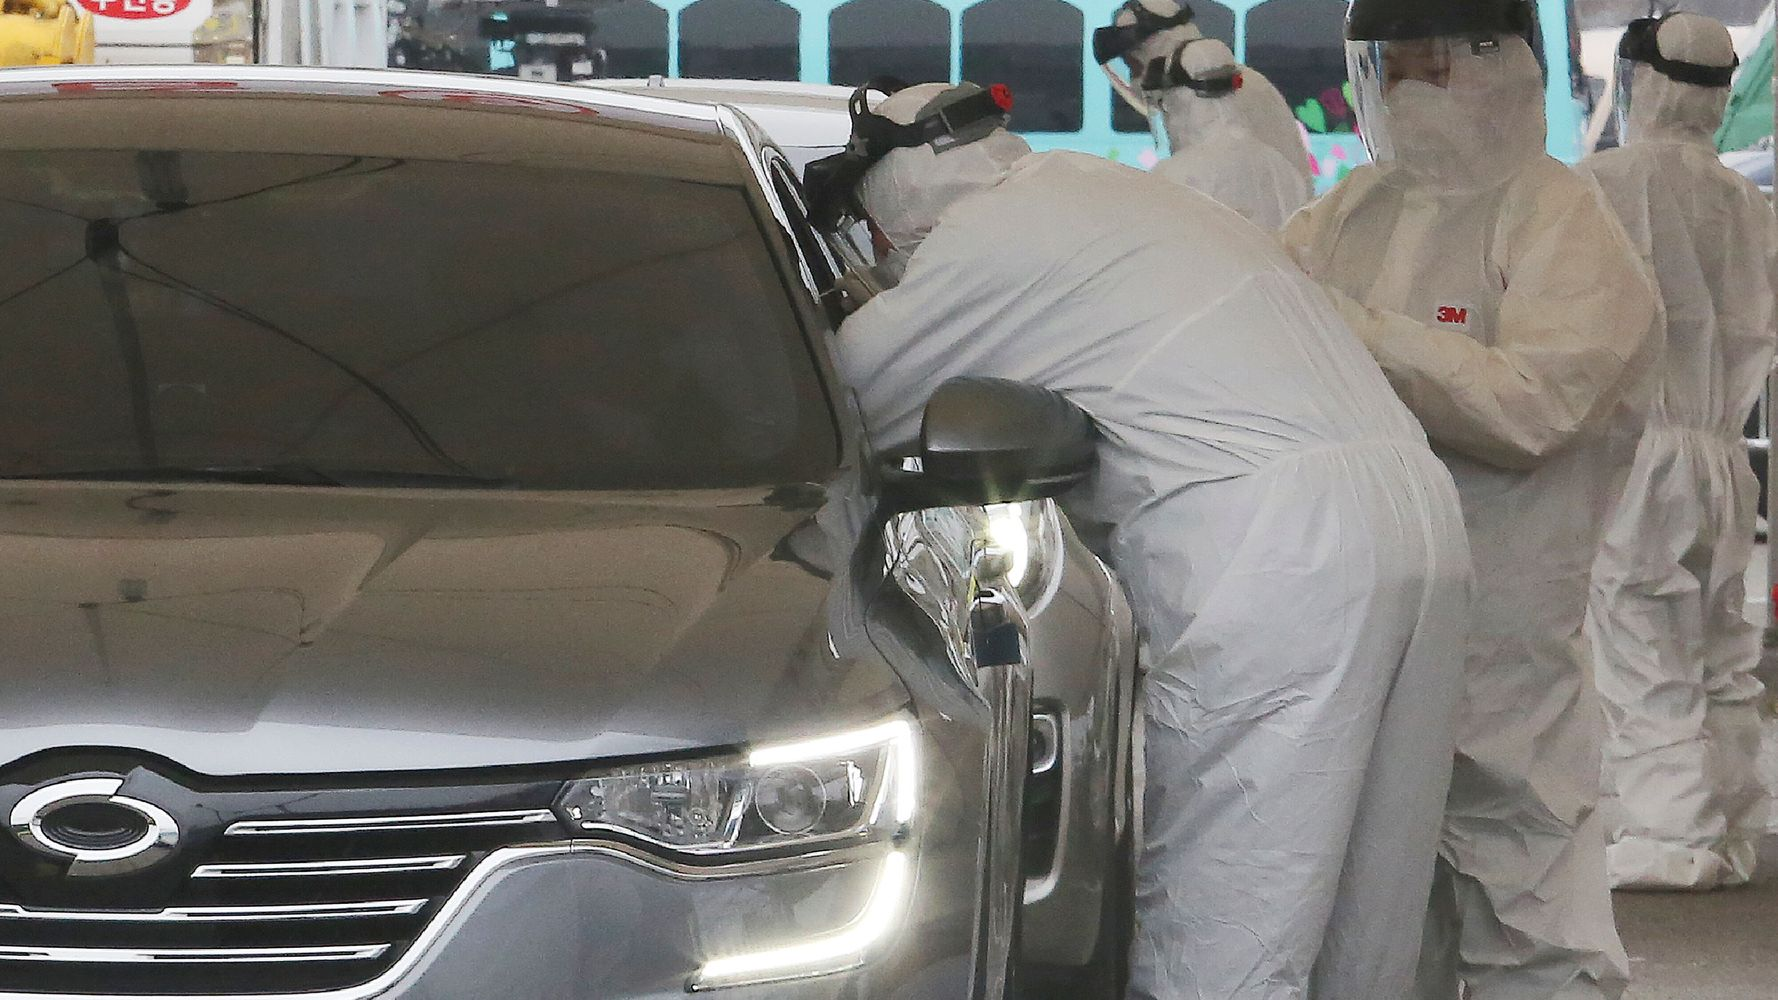 How Korea Succeeded Where The U.S. Has Failed On Coronavirus Testing